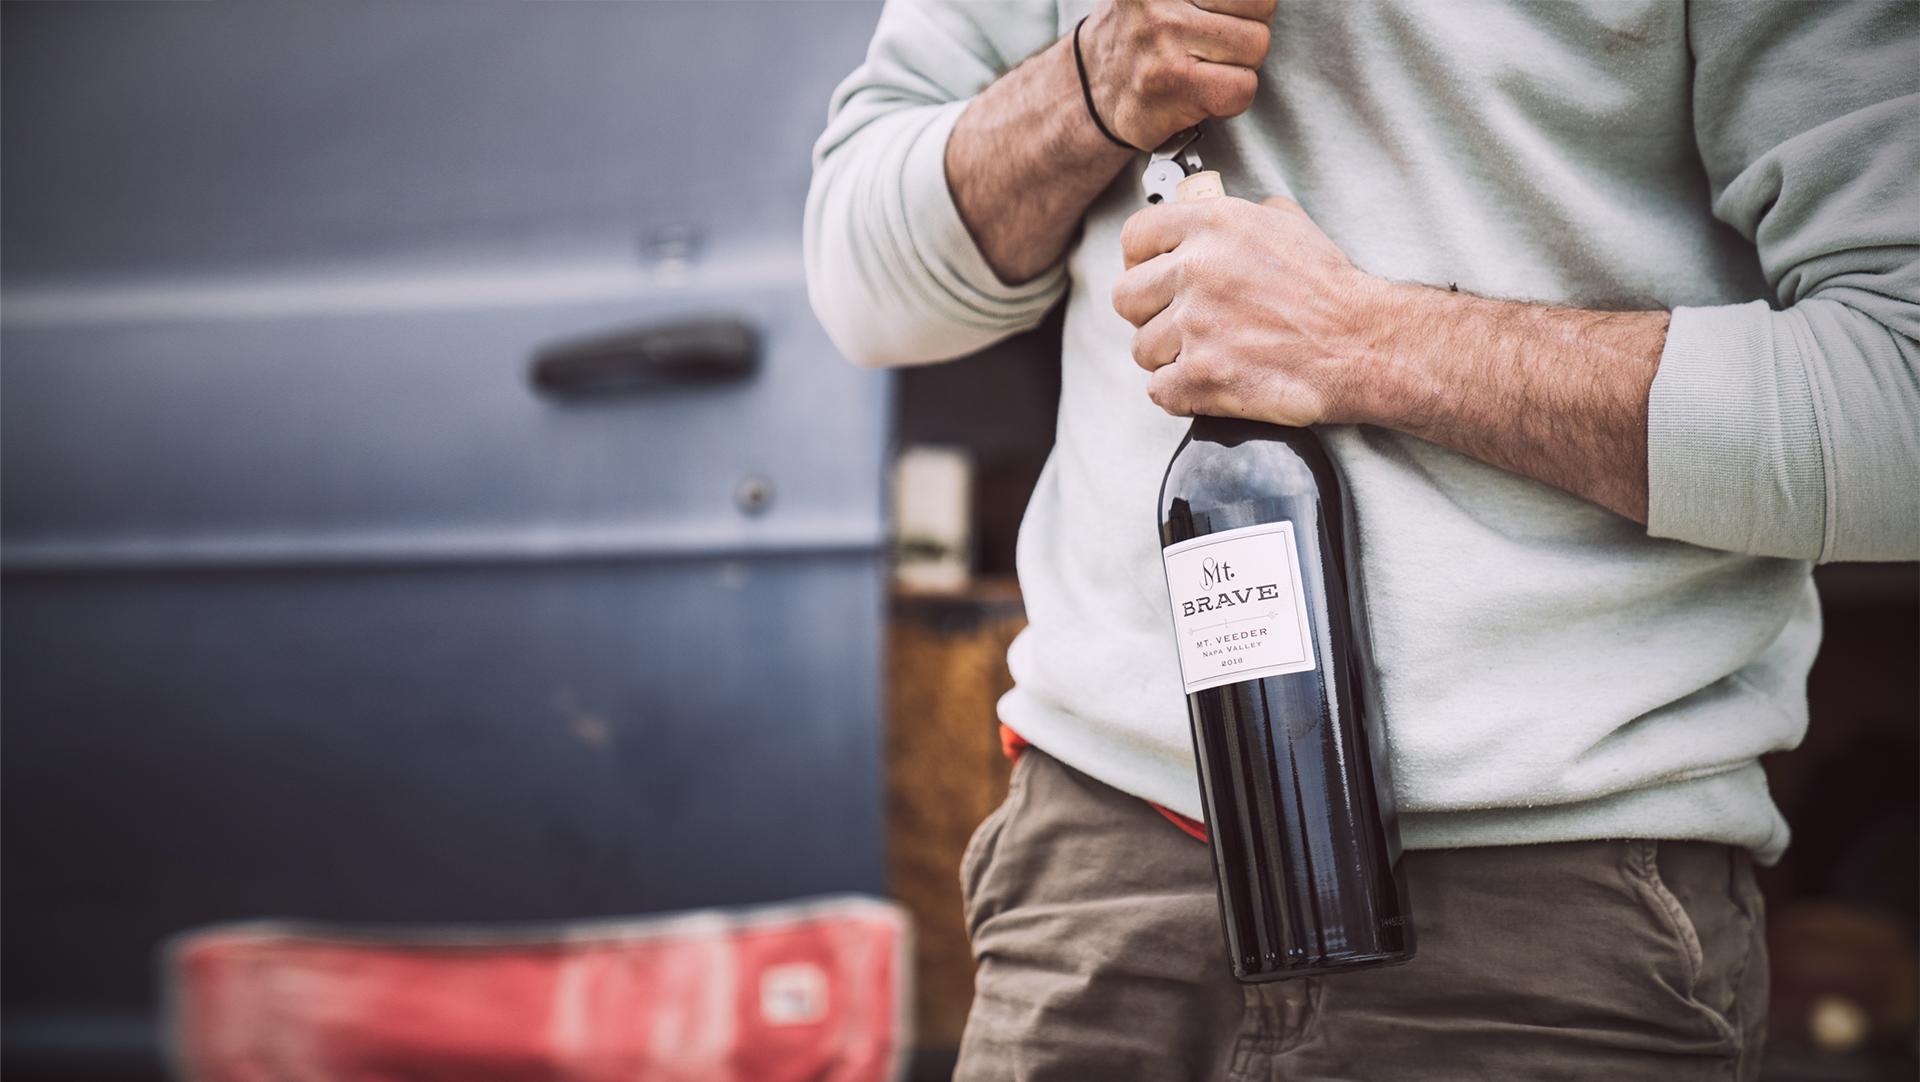 Man holding wine bottle